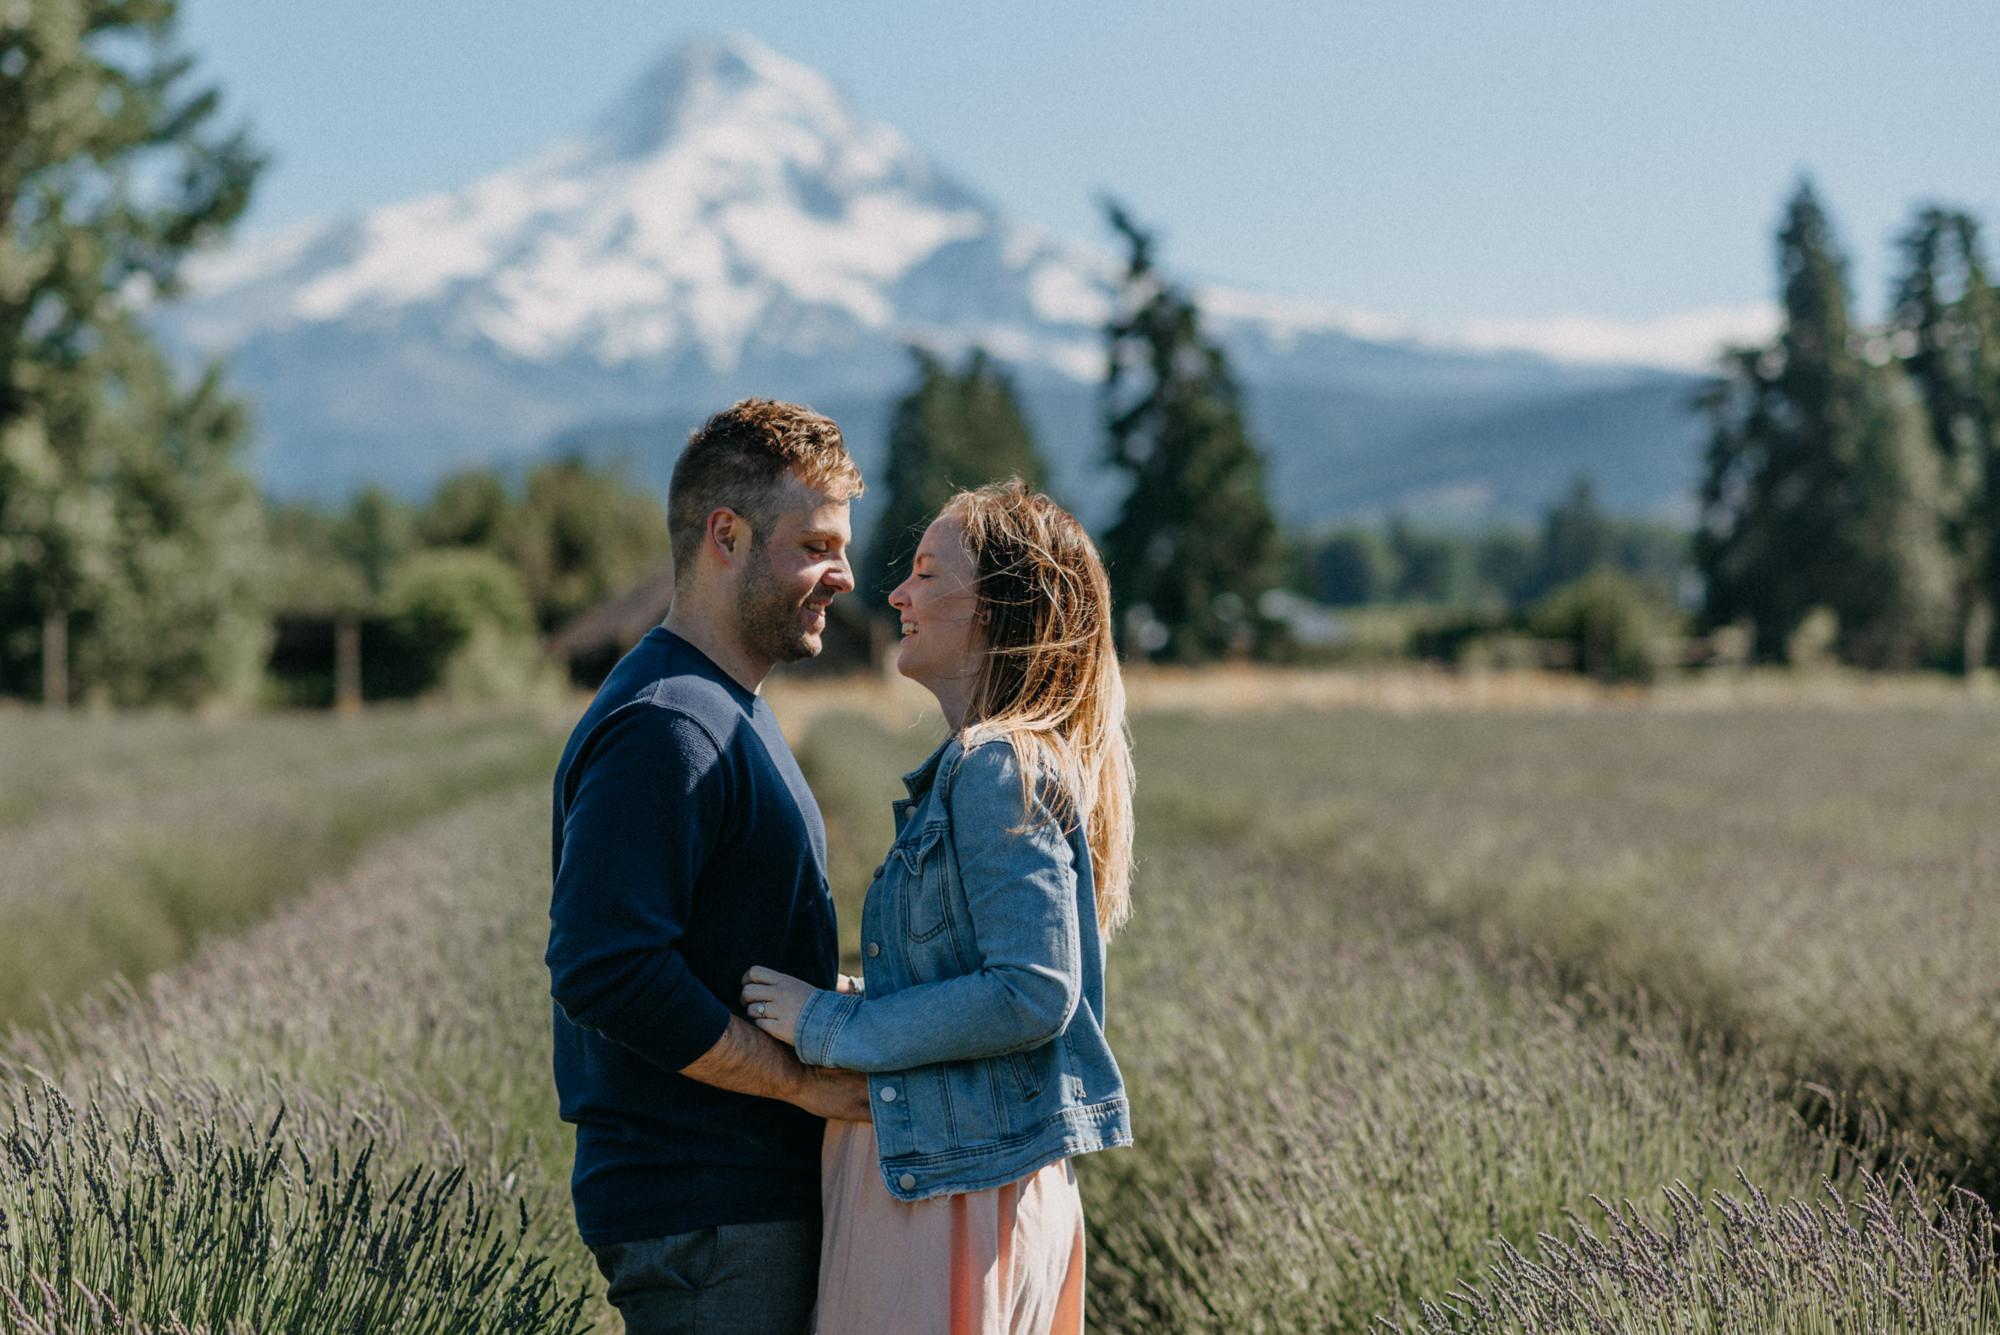 26-Mt-hood-lavender-farms-engagment-couple-summer-7689.jpg